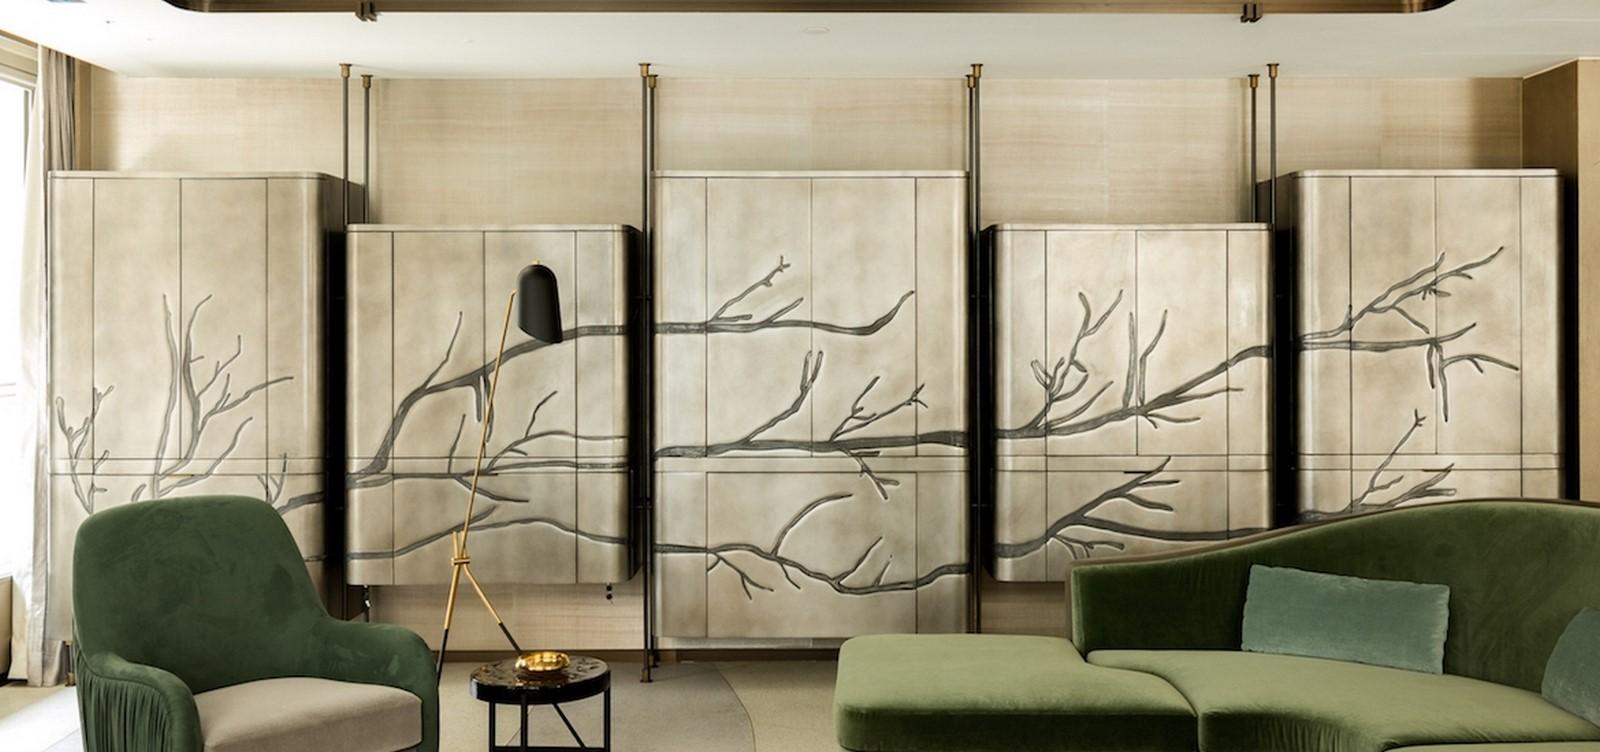 Joyce Wang Studio- 10 Iconic Products - Sheet26